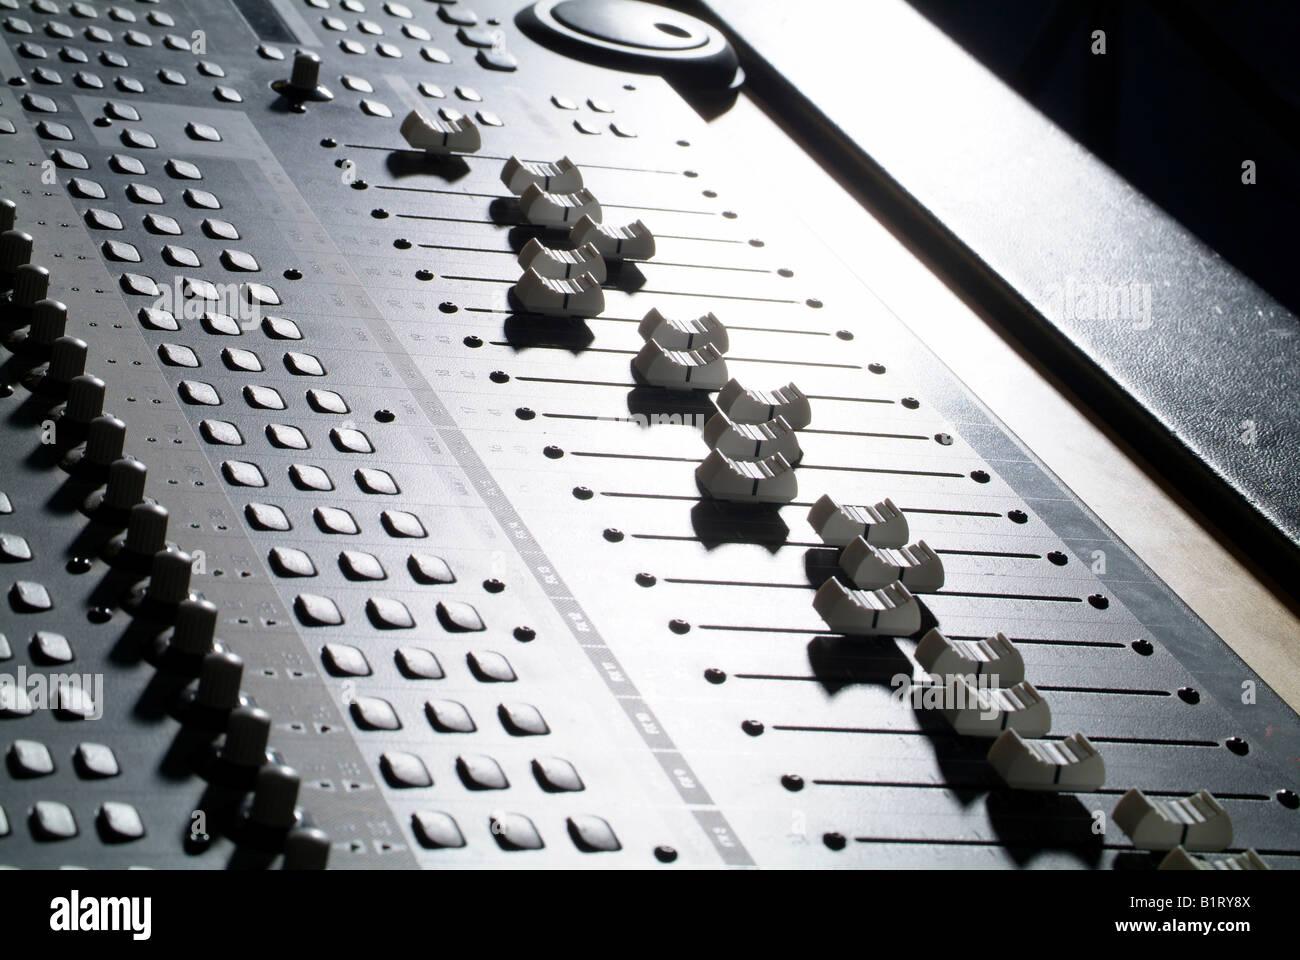 Control keys, professional mixing console, mixing desk, soundboard - Stock Image